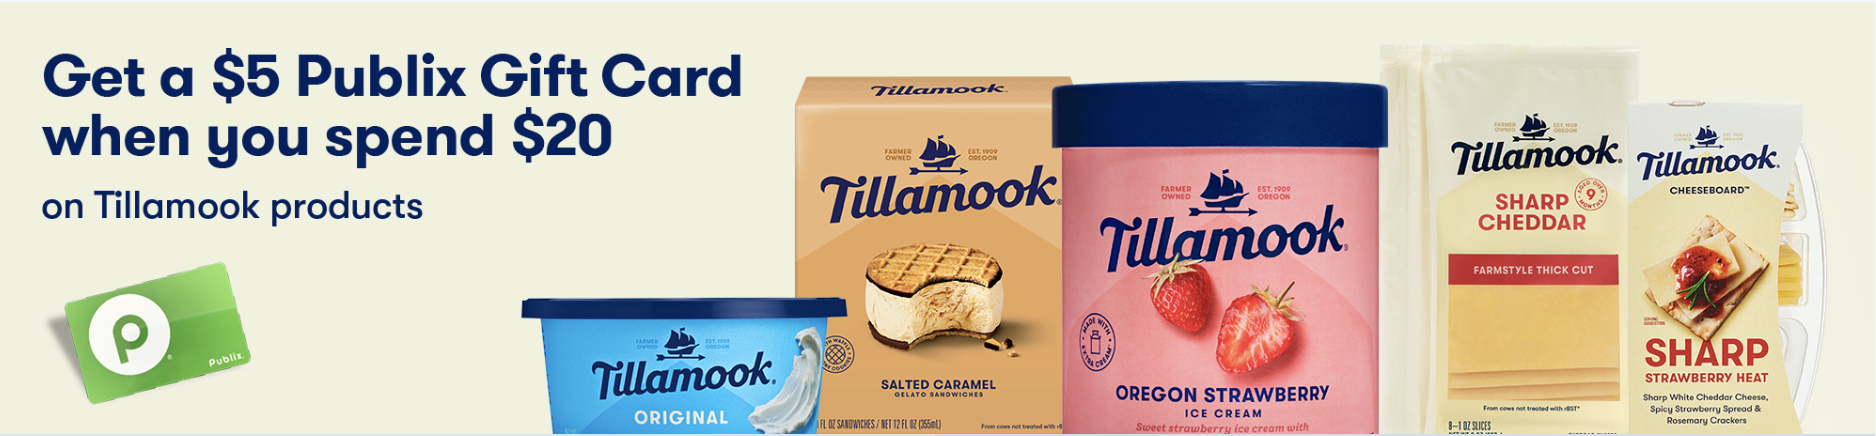 Tillamook Products Make Summer Entertaining Delicious AND Rewarding! on I Heart Publix